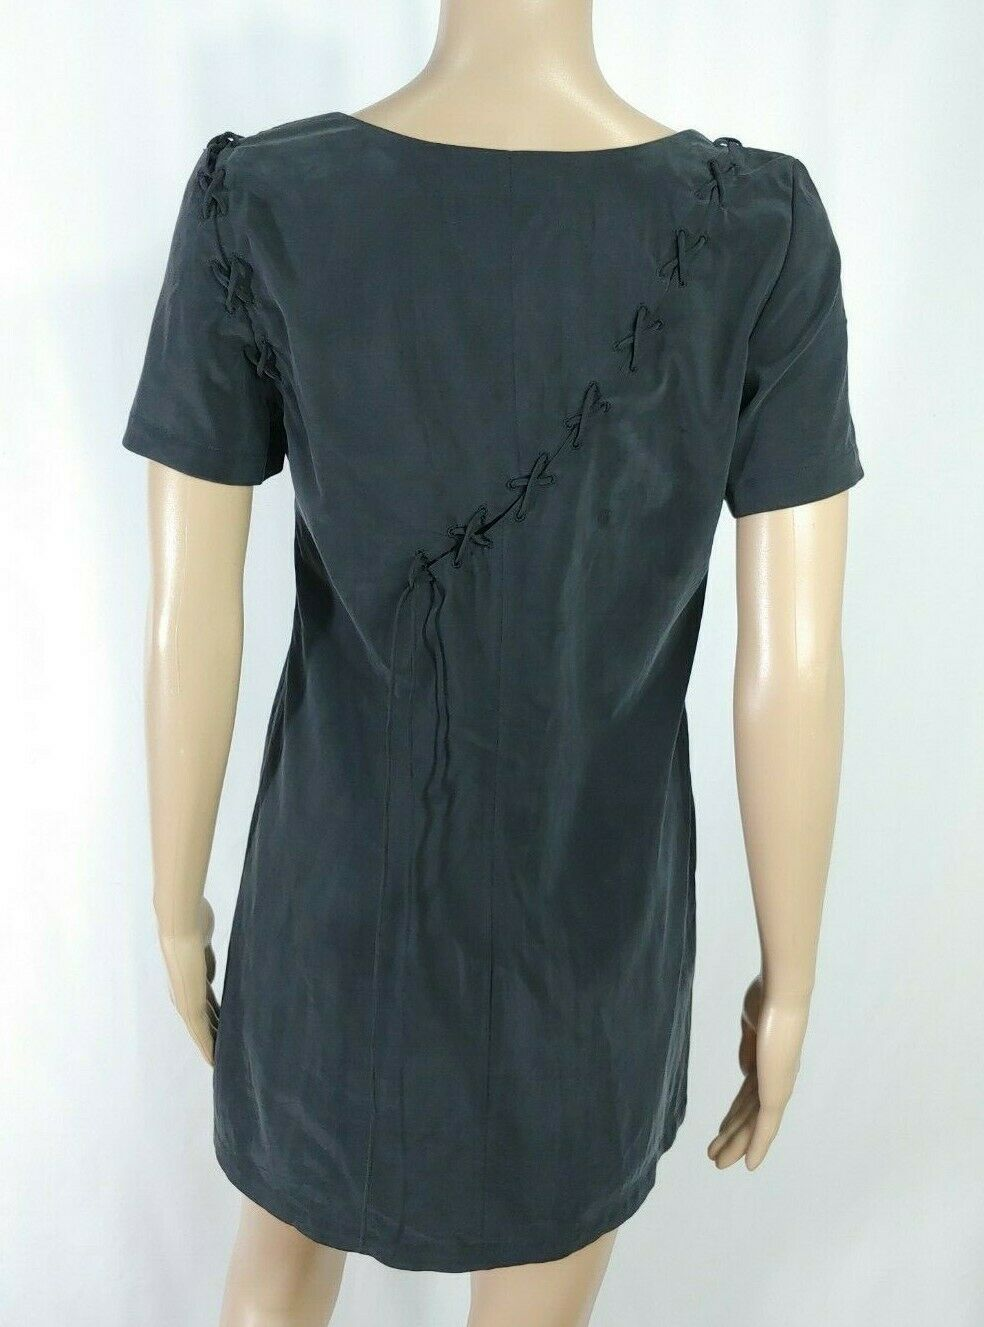 Mackage $395 Black Cupro Lace Up Minimalist Goth Mini Tunic Shift Shirt Dress S